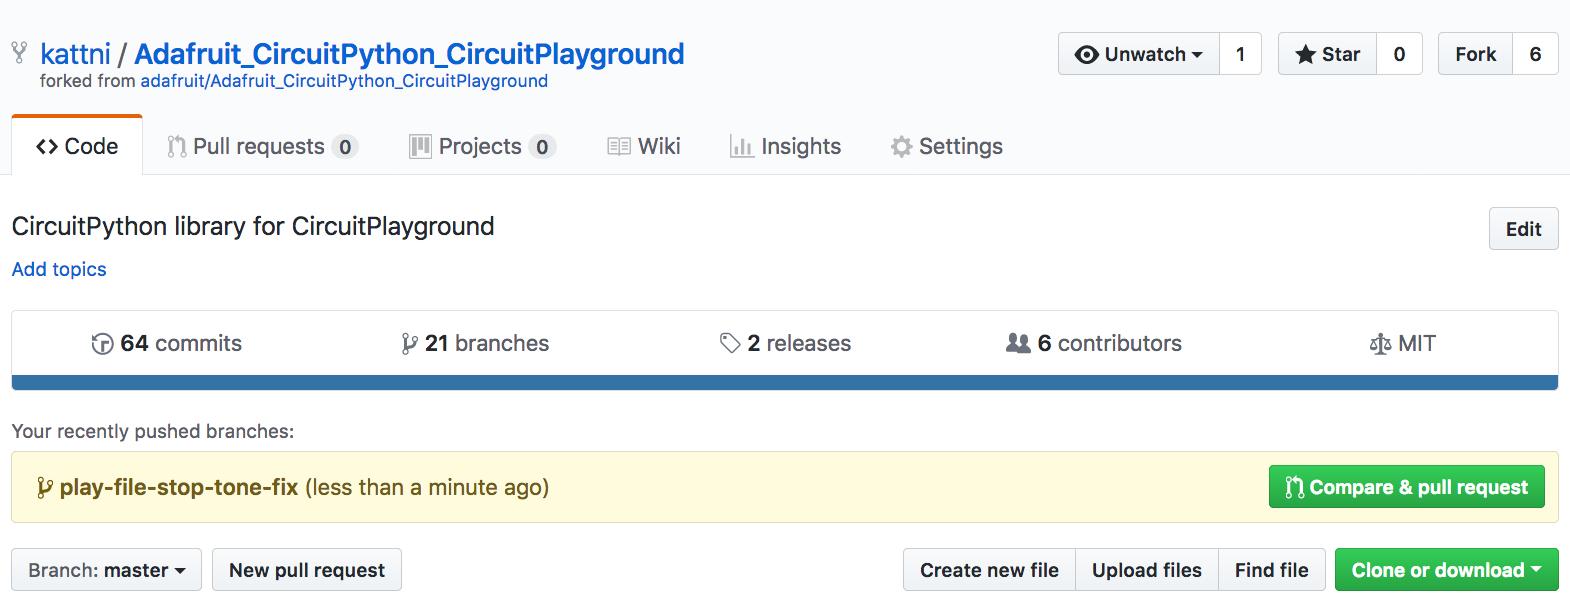 circuitpython_GitHubCompareAndPullRequest.png